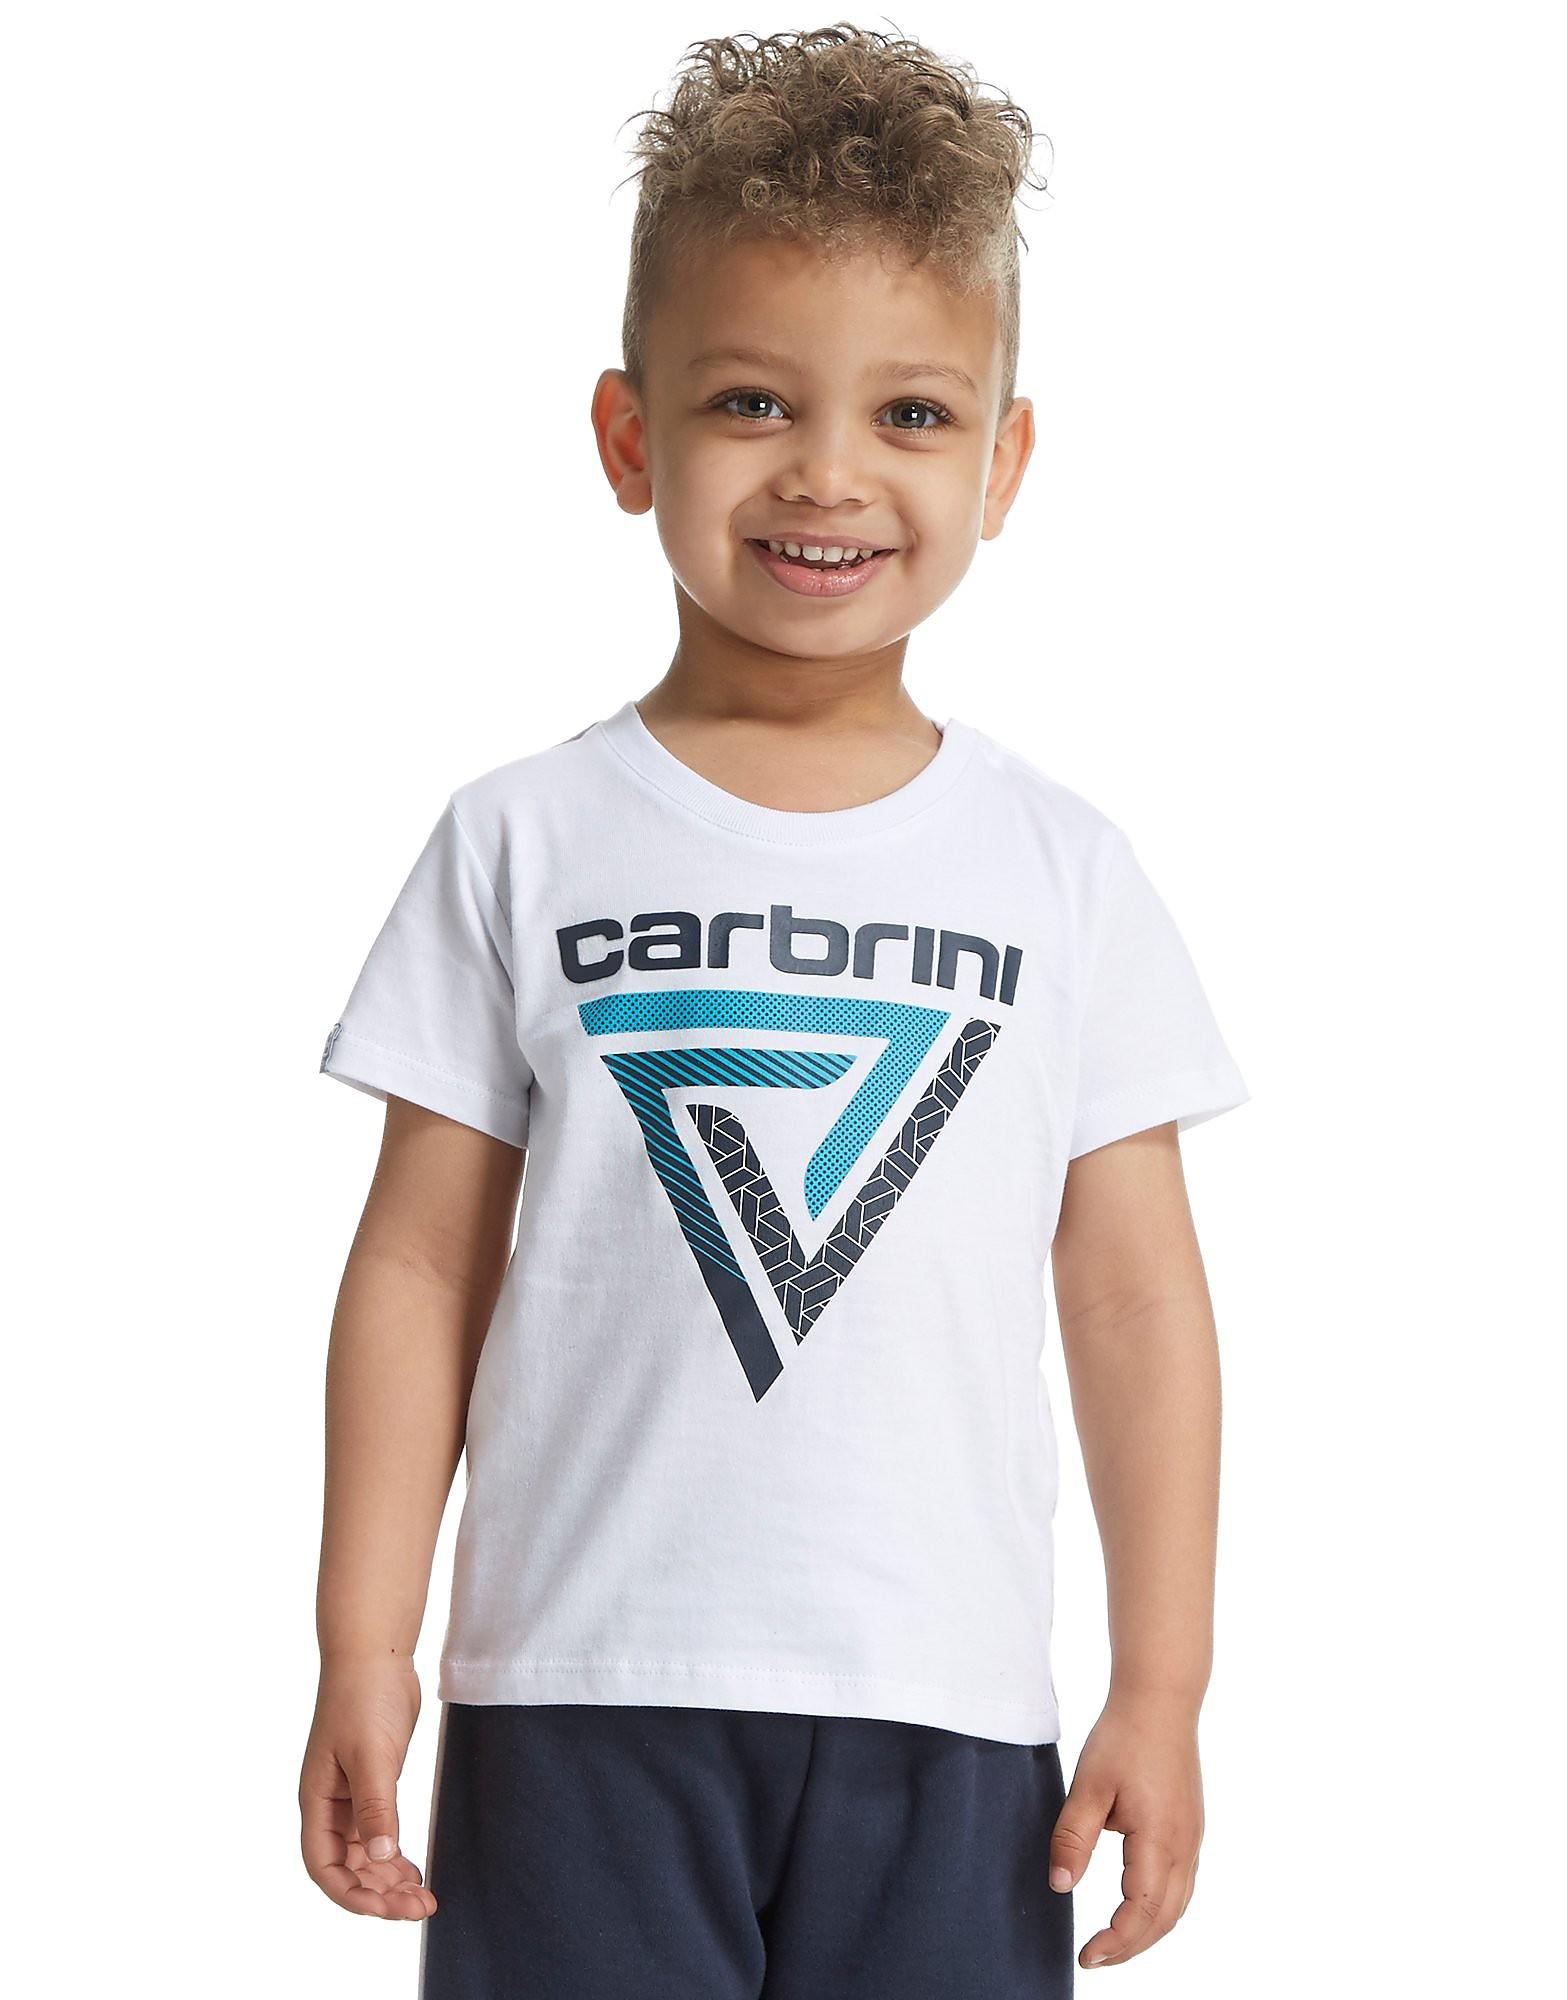 Carbrini Curzon T-Shirt Baby